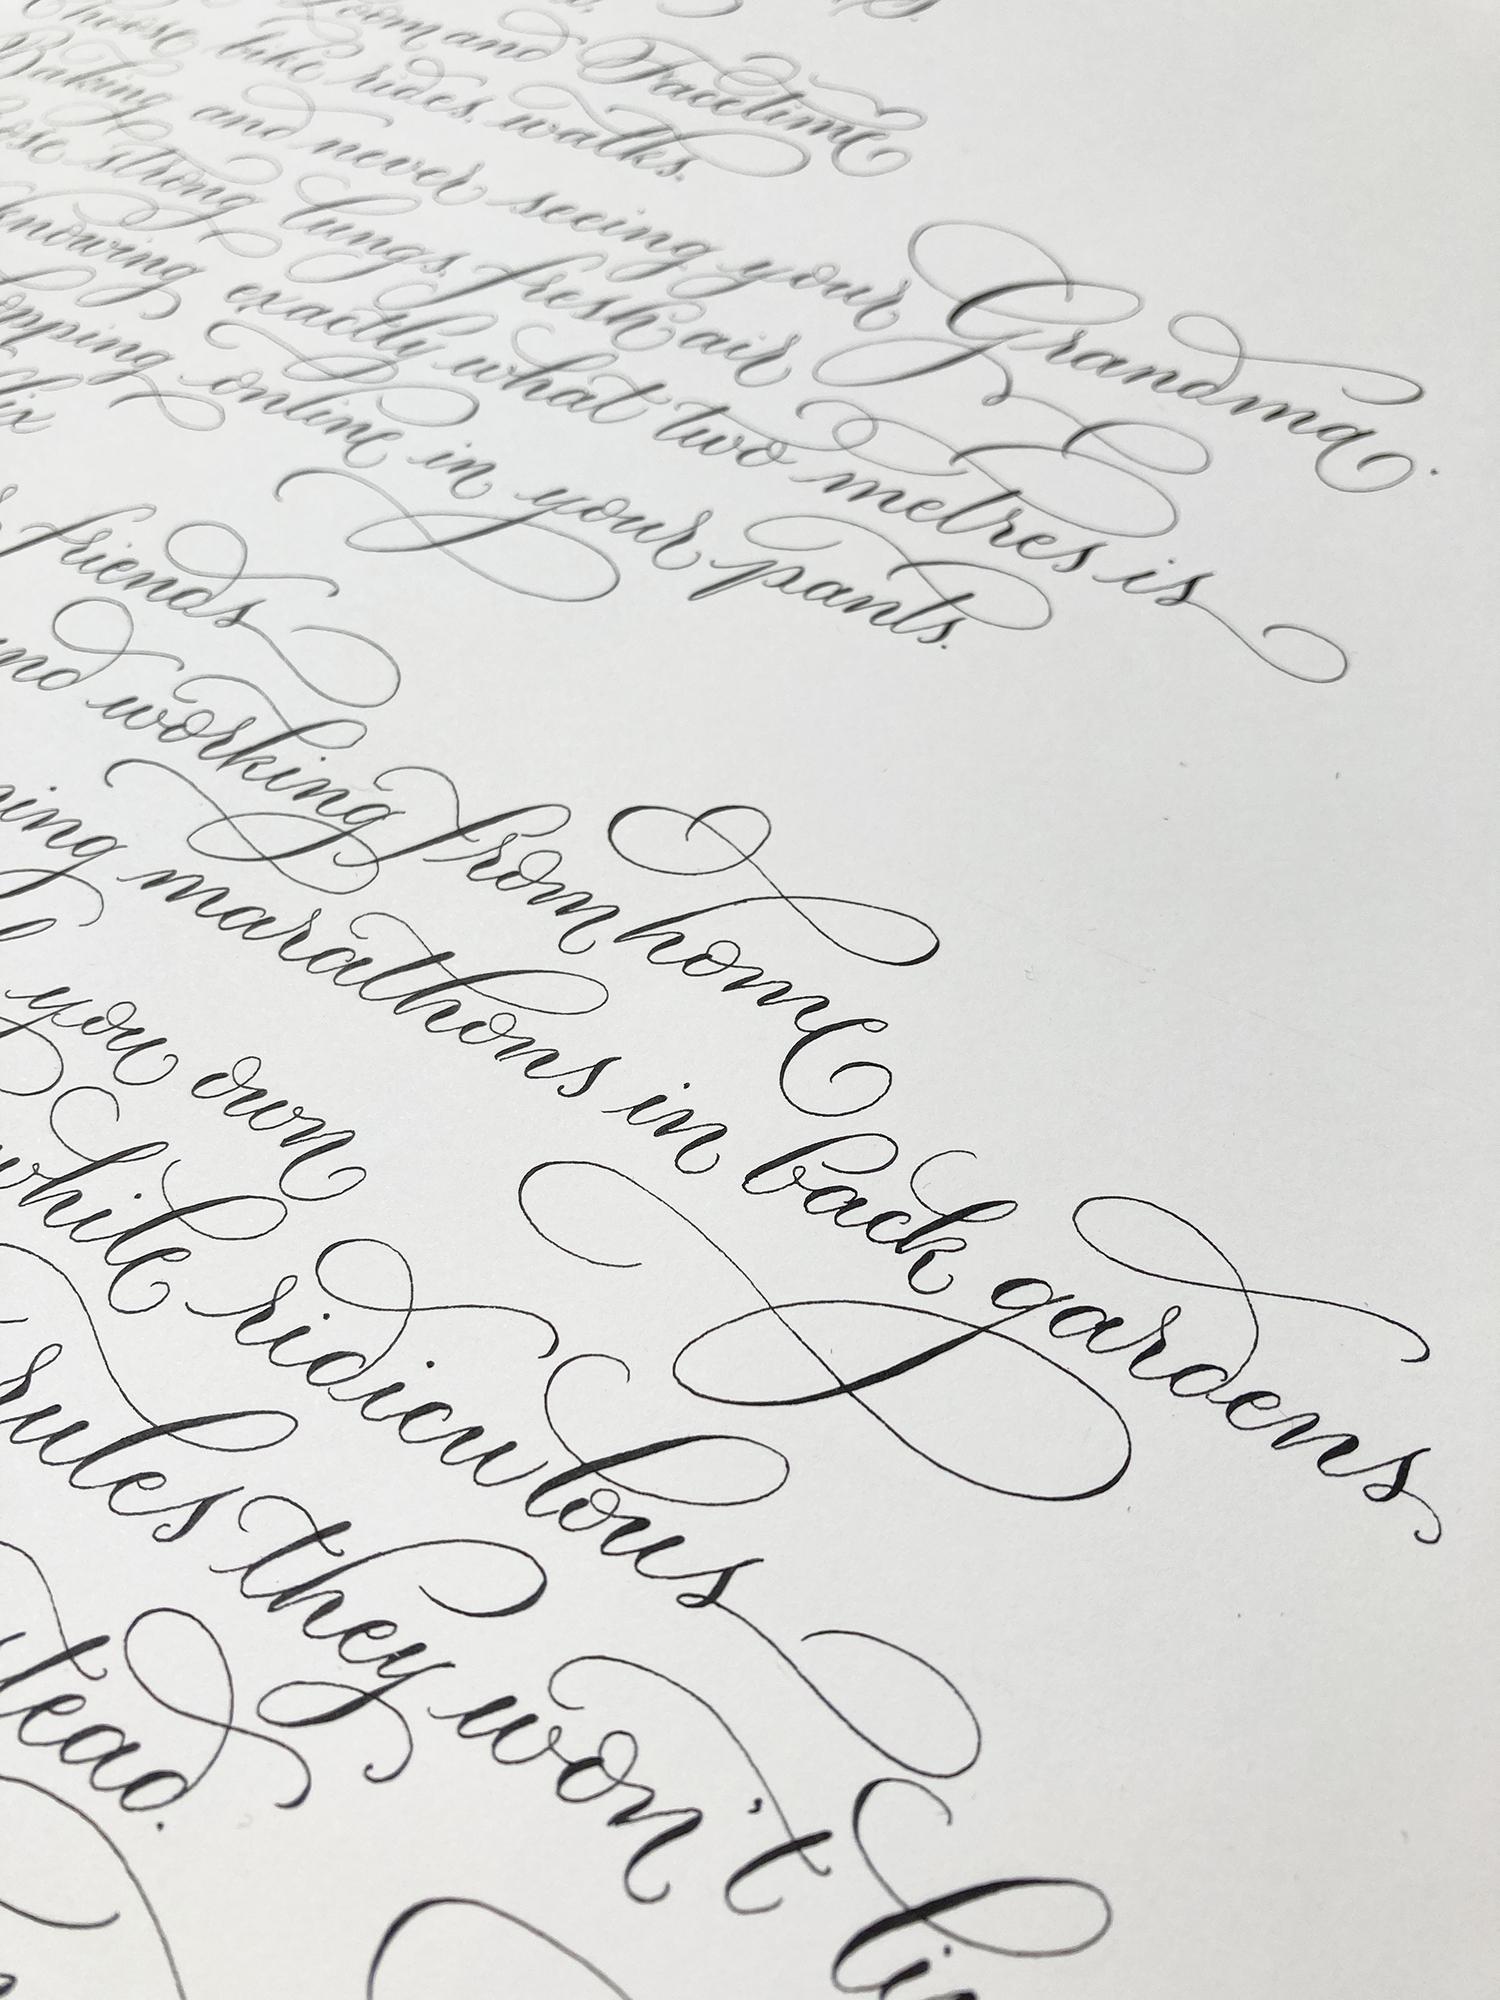 Handwritten calligraphy project UK calligrapher 2020